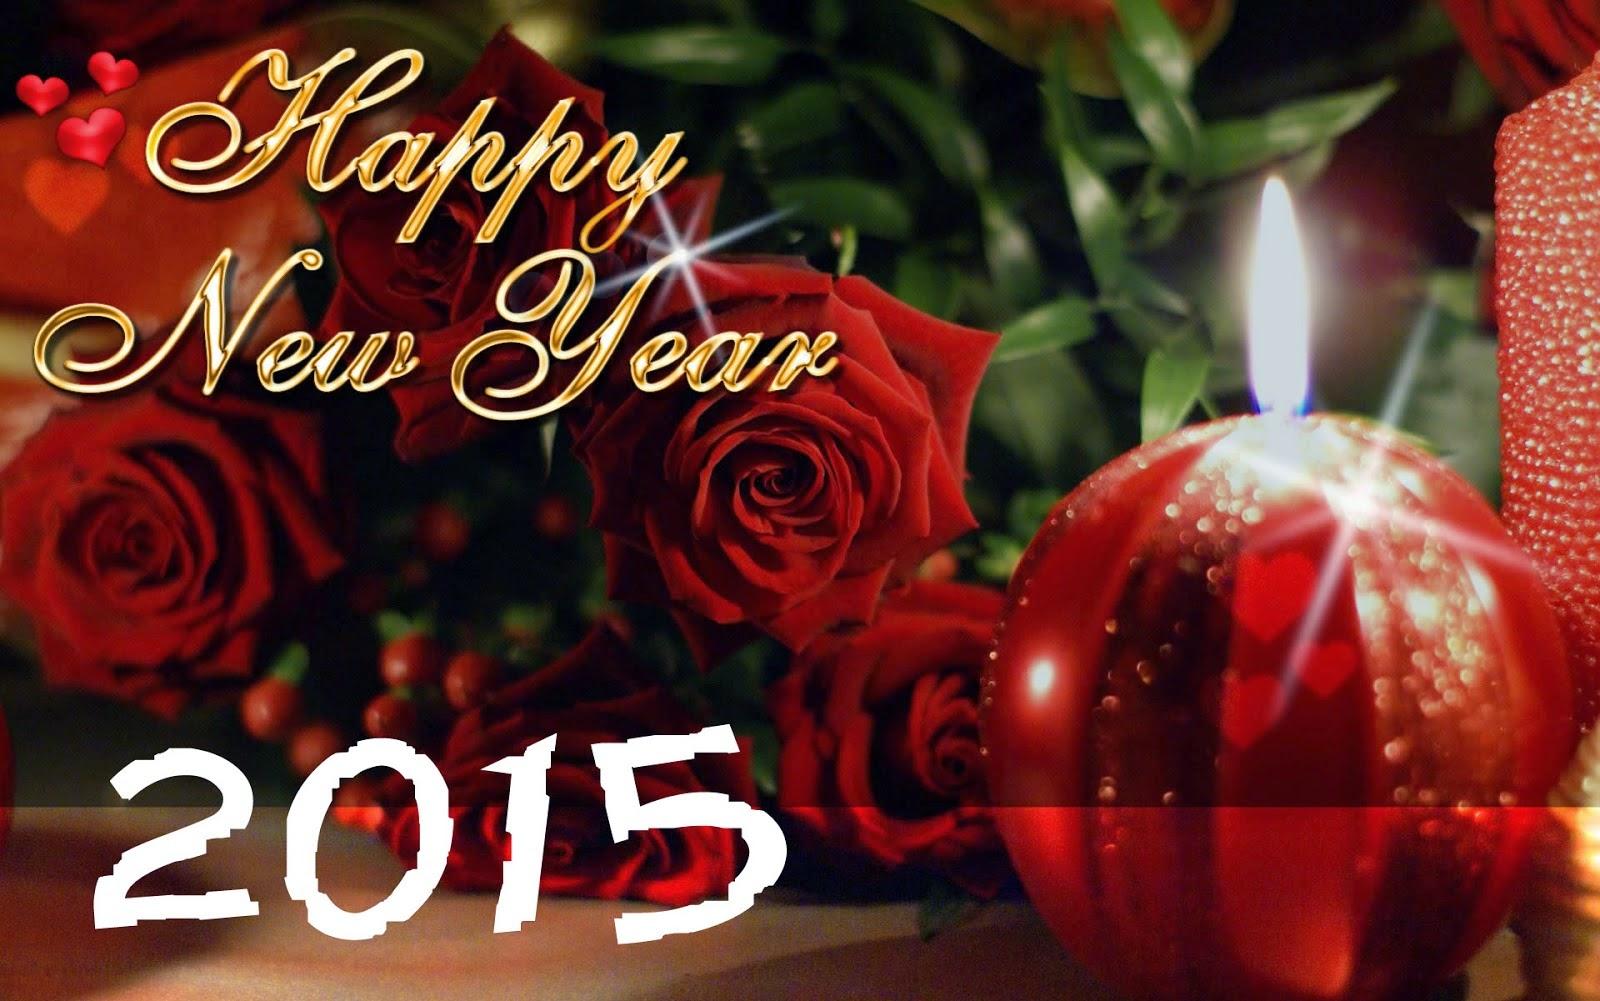 Gambar Kartu Ucapan Selamat Tahun Baru 2015 Kata-Kata Happy New Year 2015